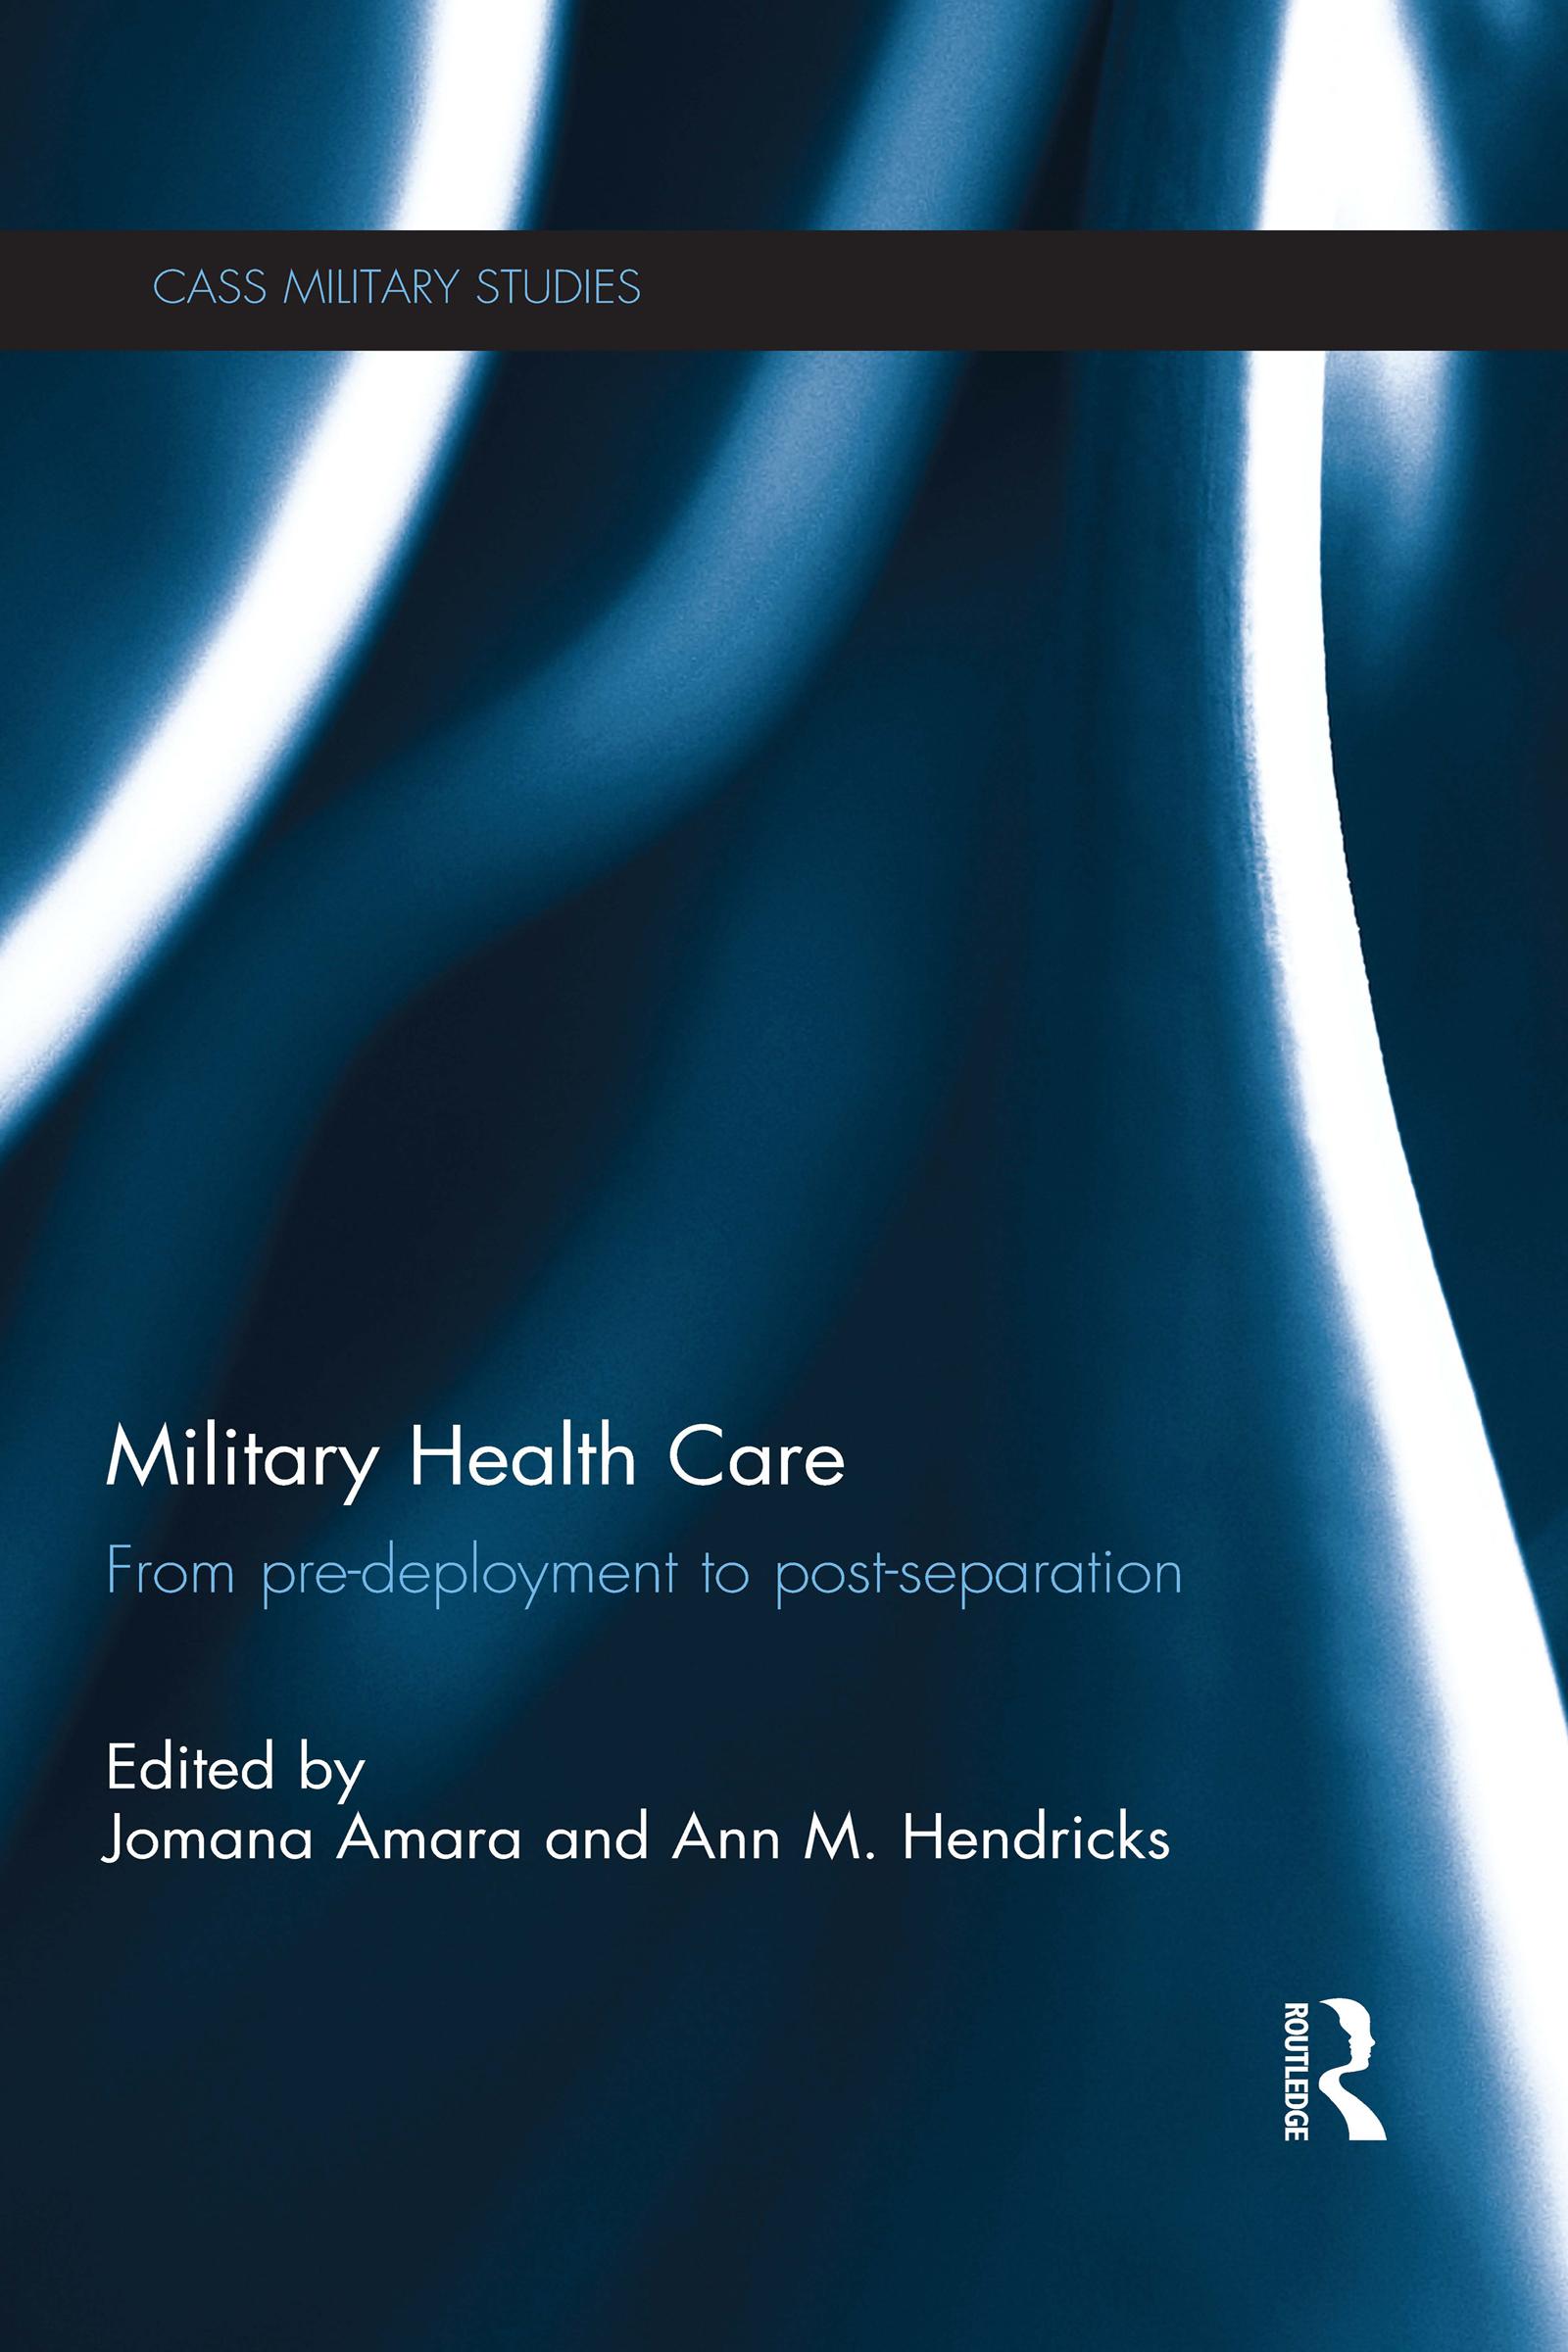 Military Health Care